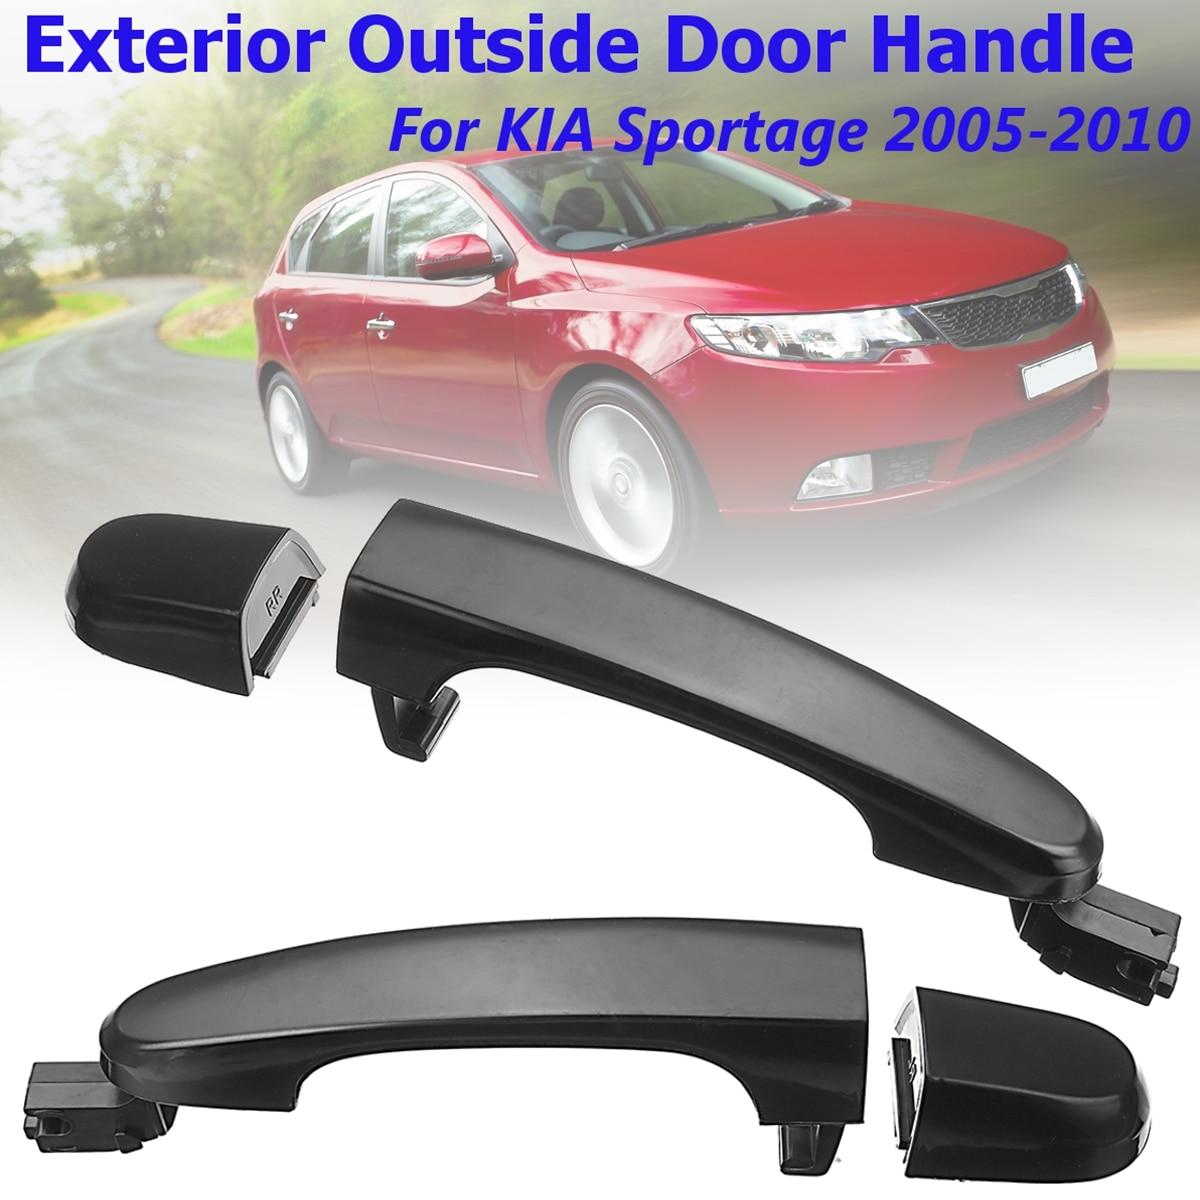 Autoleader Rear Left/Right Exterior Outside Door Handle For KIA Sportage 2005 2006 2007 2008 2009 2010 for kia sorento 2006 2007 2008 2009 white